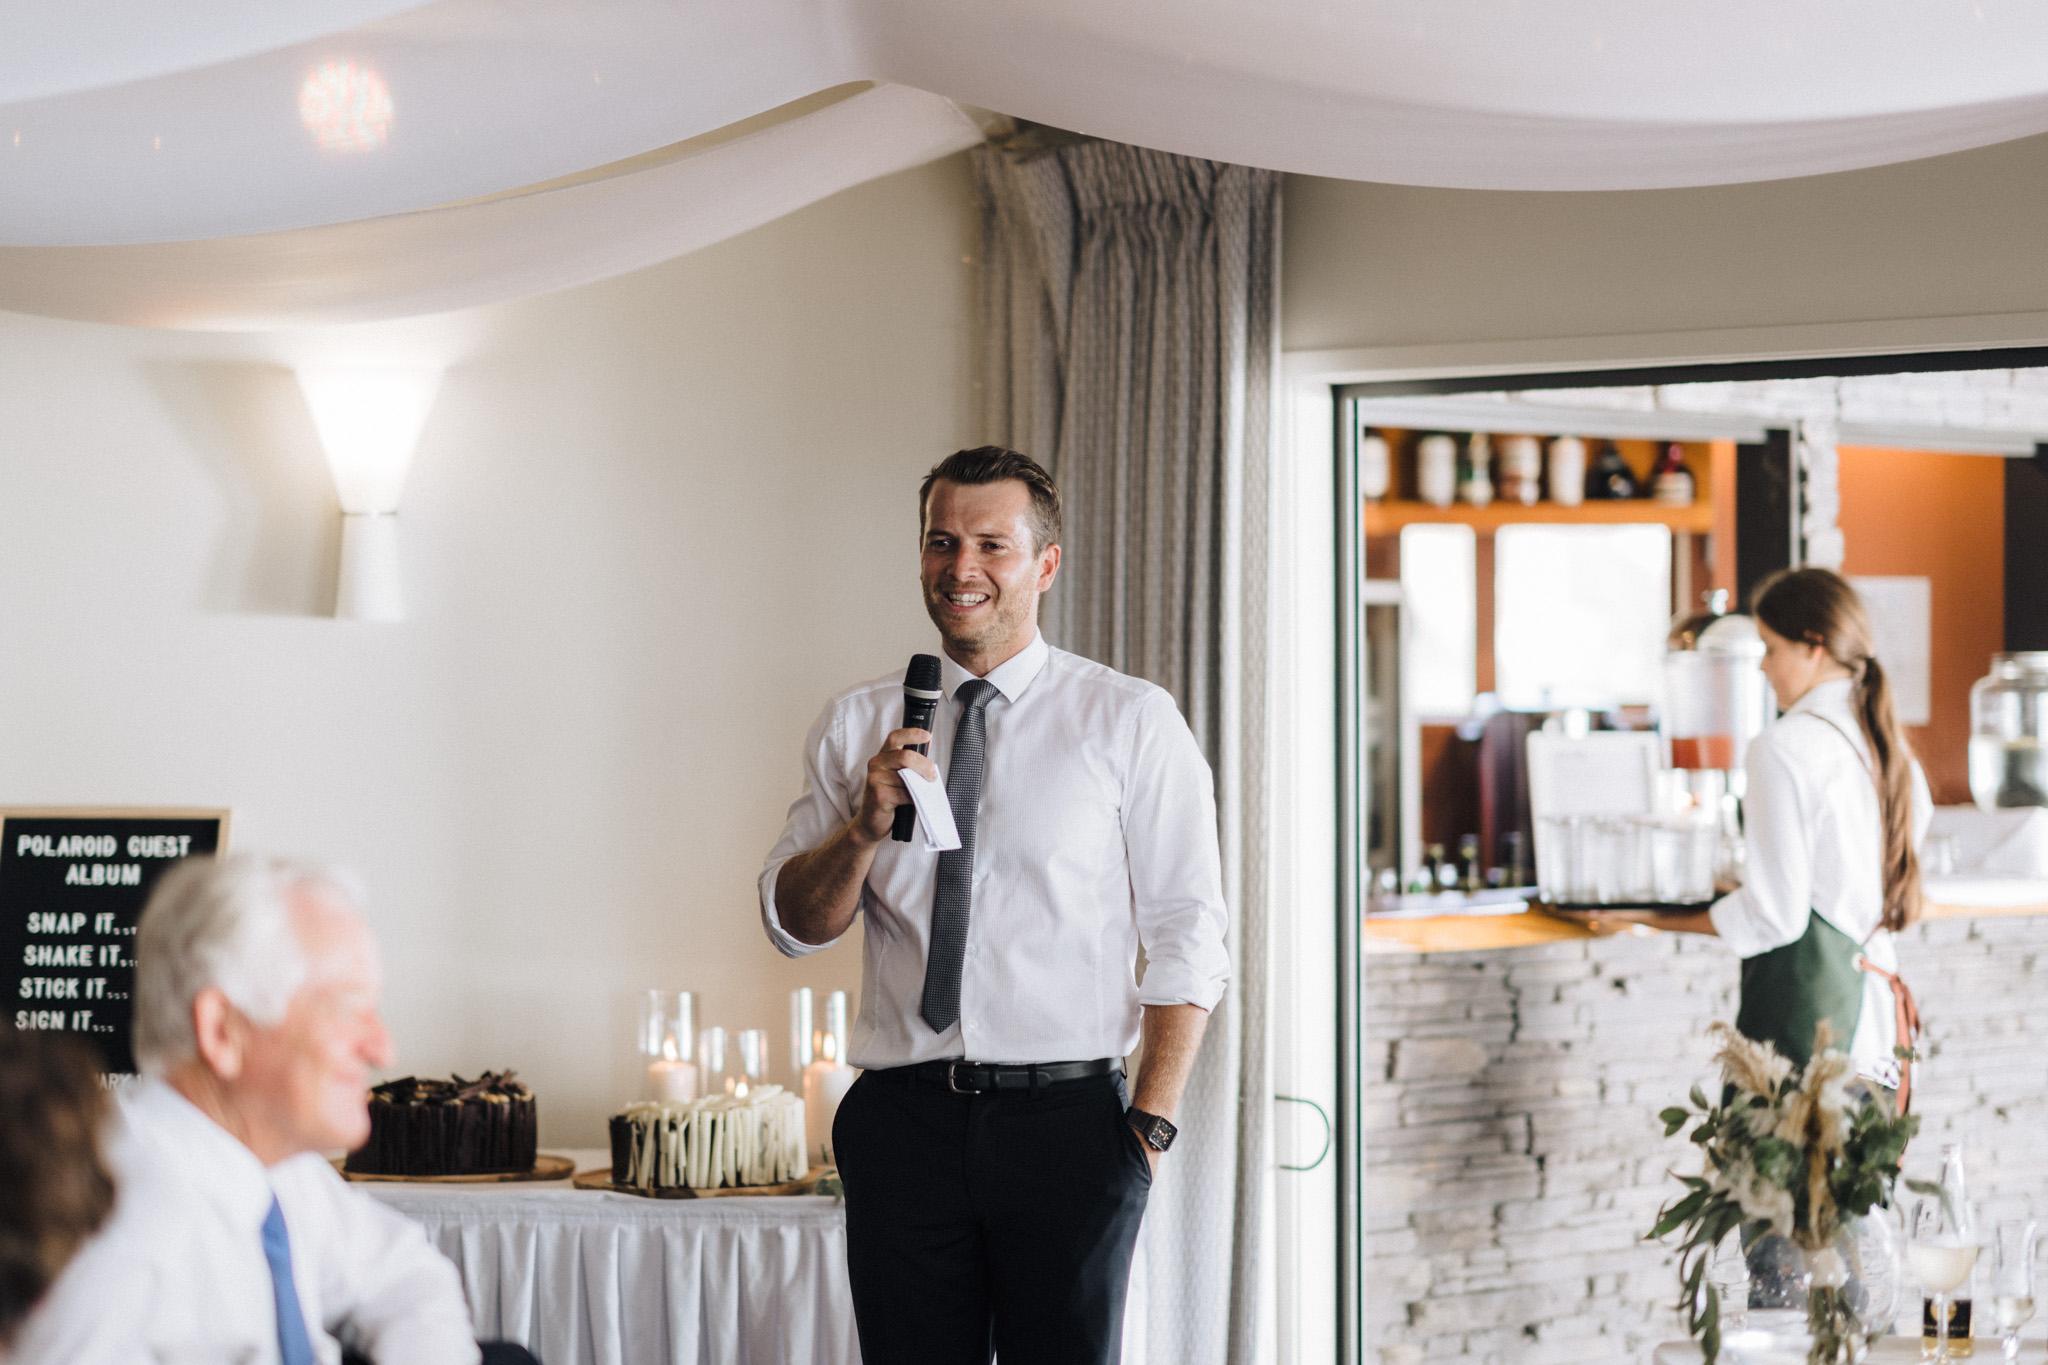 newfound-h-m-castaways-waiuku-auckland-wedding-photographer-143